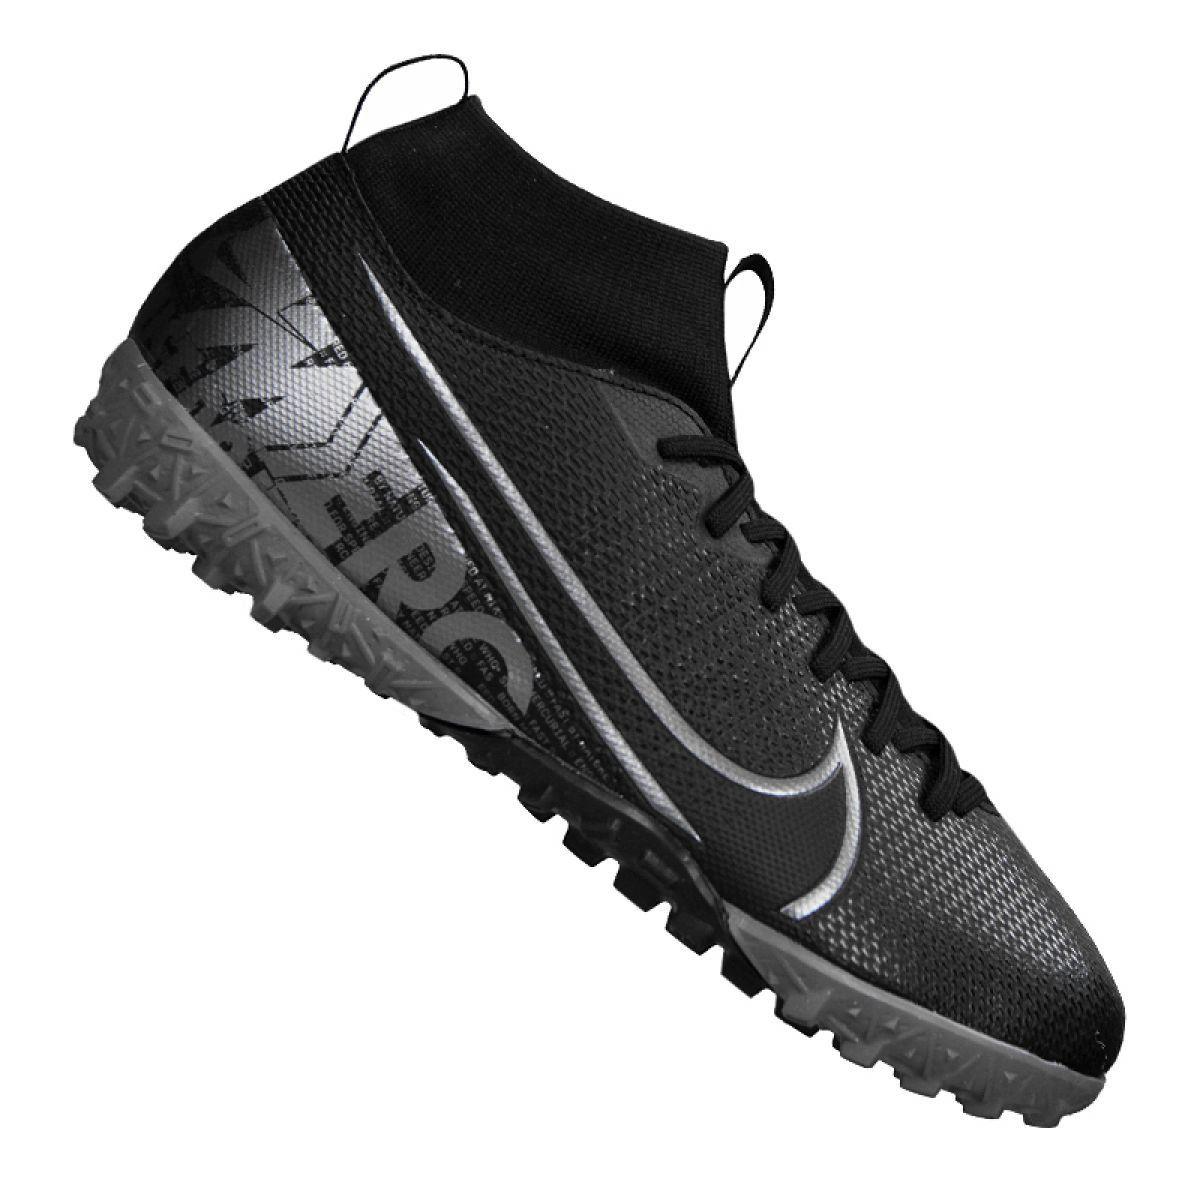 Buty Pilkarskie Nike Superfly 7 Academy Tf Jr At8143 001 Czarne Czarne Junior Boots Football Shoes Nike Shoes